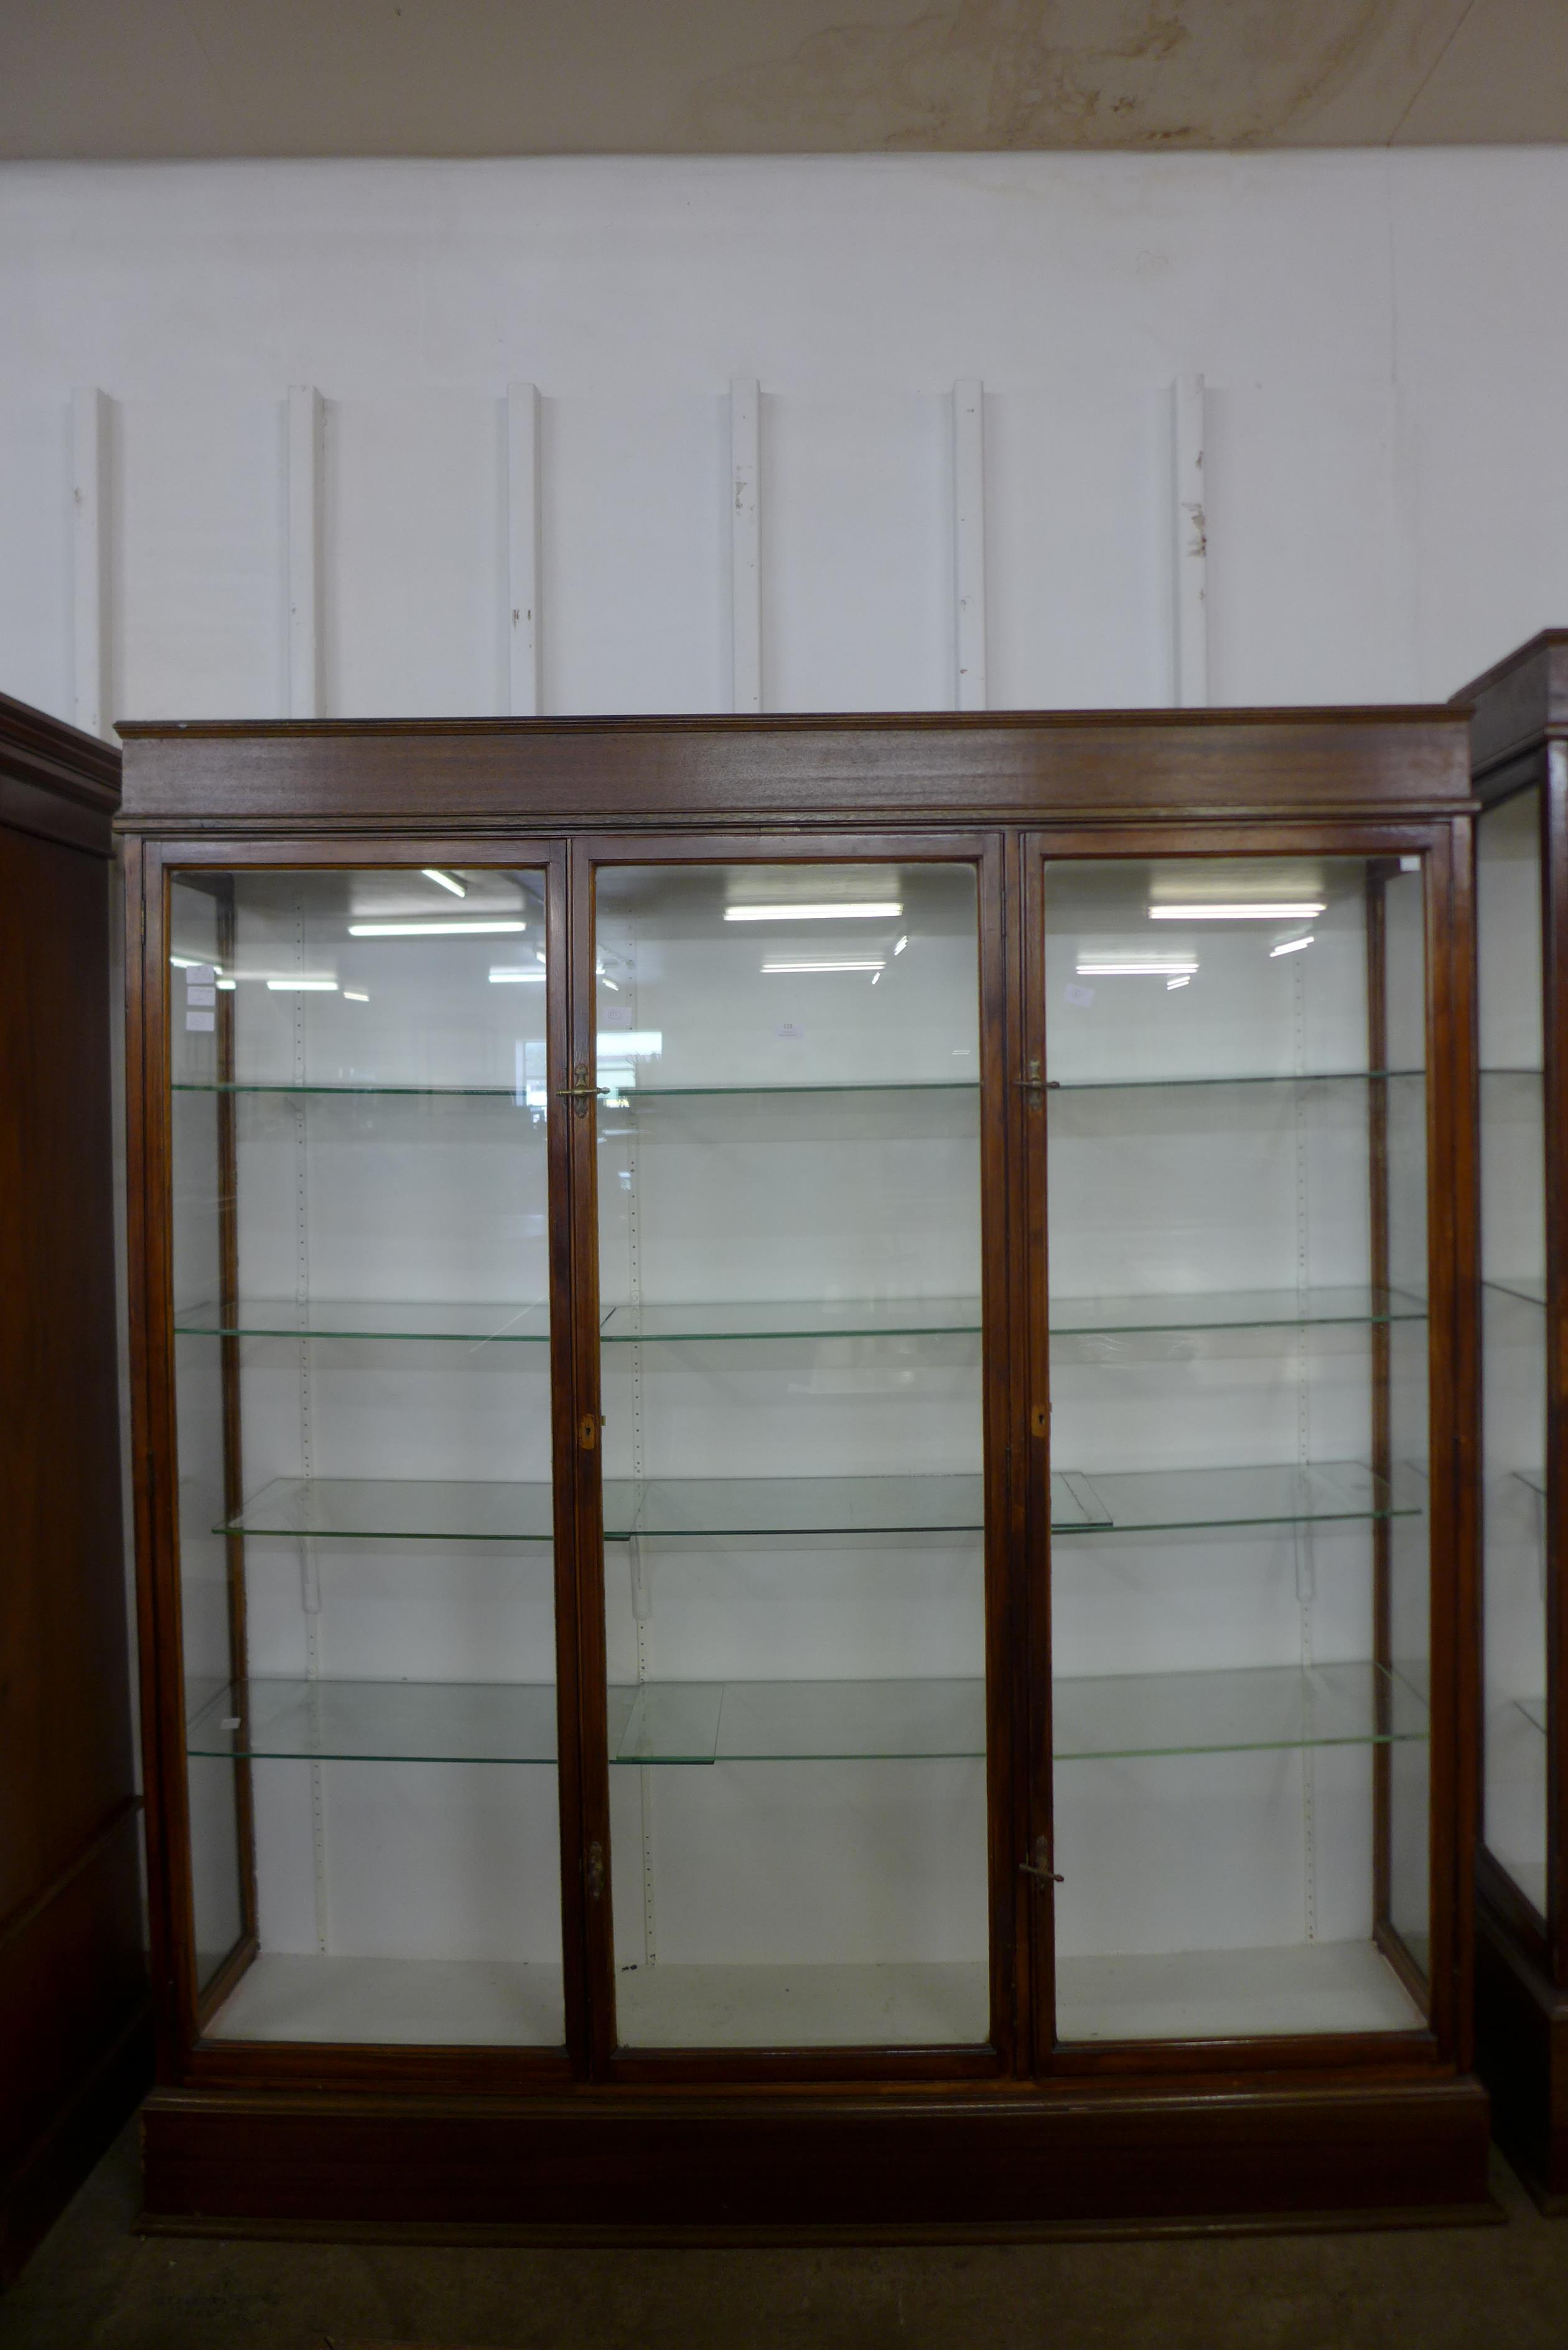 A large mahogany three door shop display cabinet, made by F. Maund & E. Berg Ltd., Showcases &